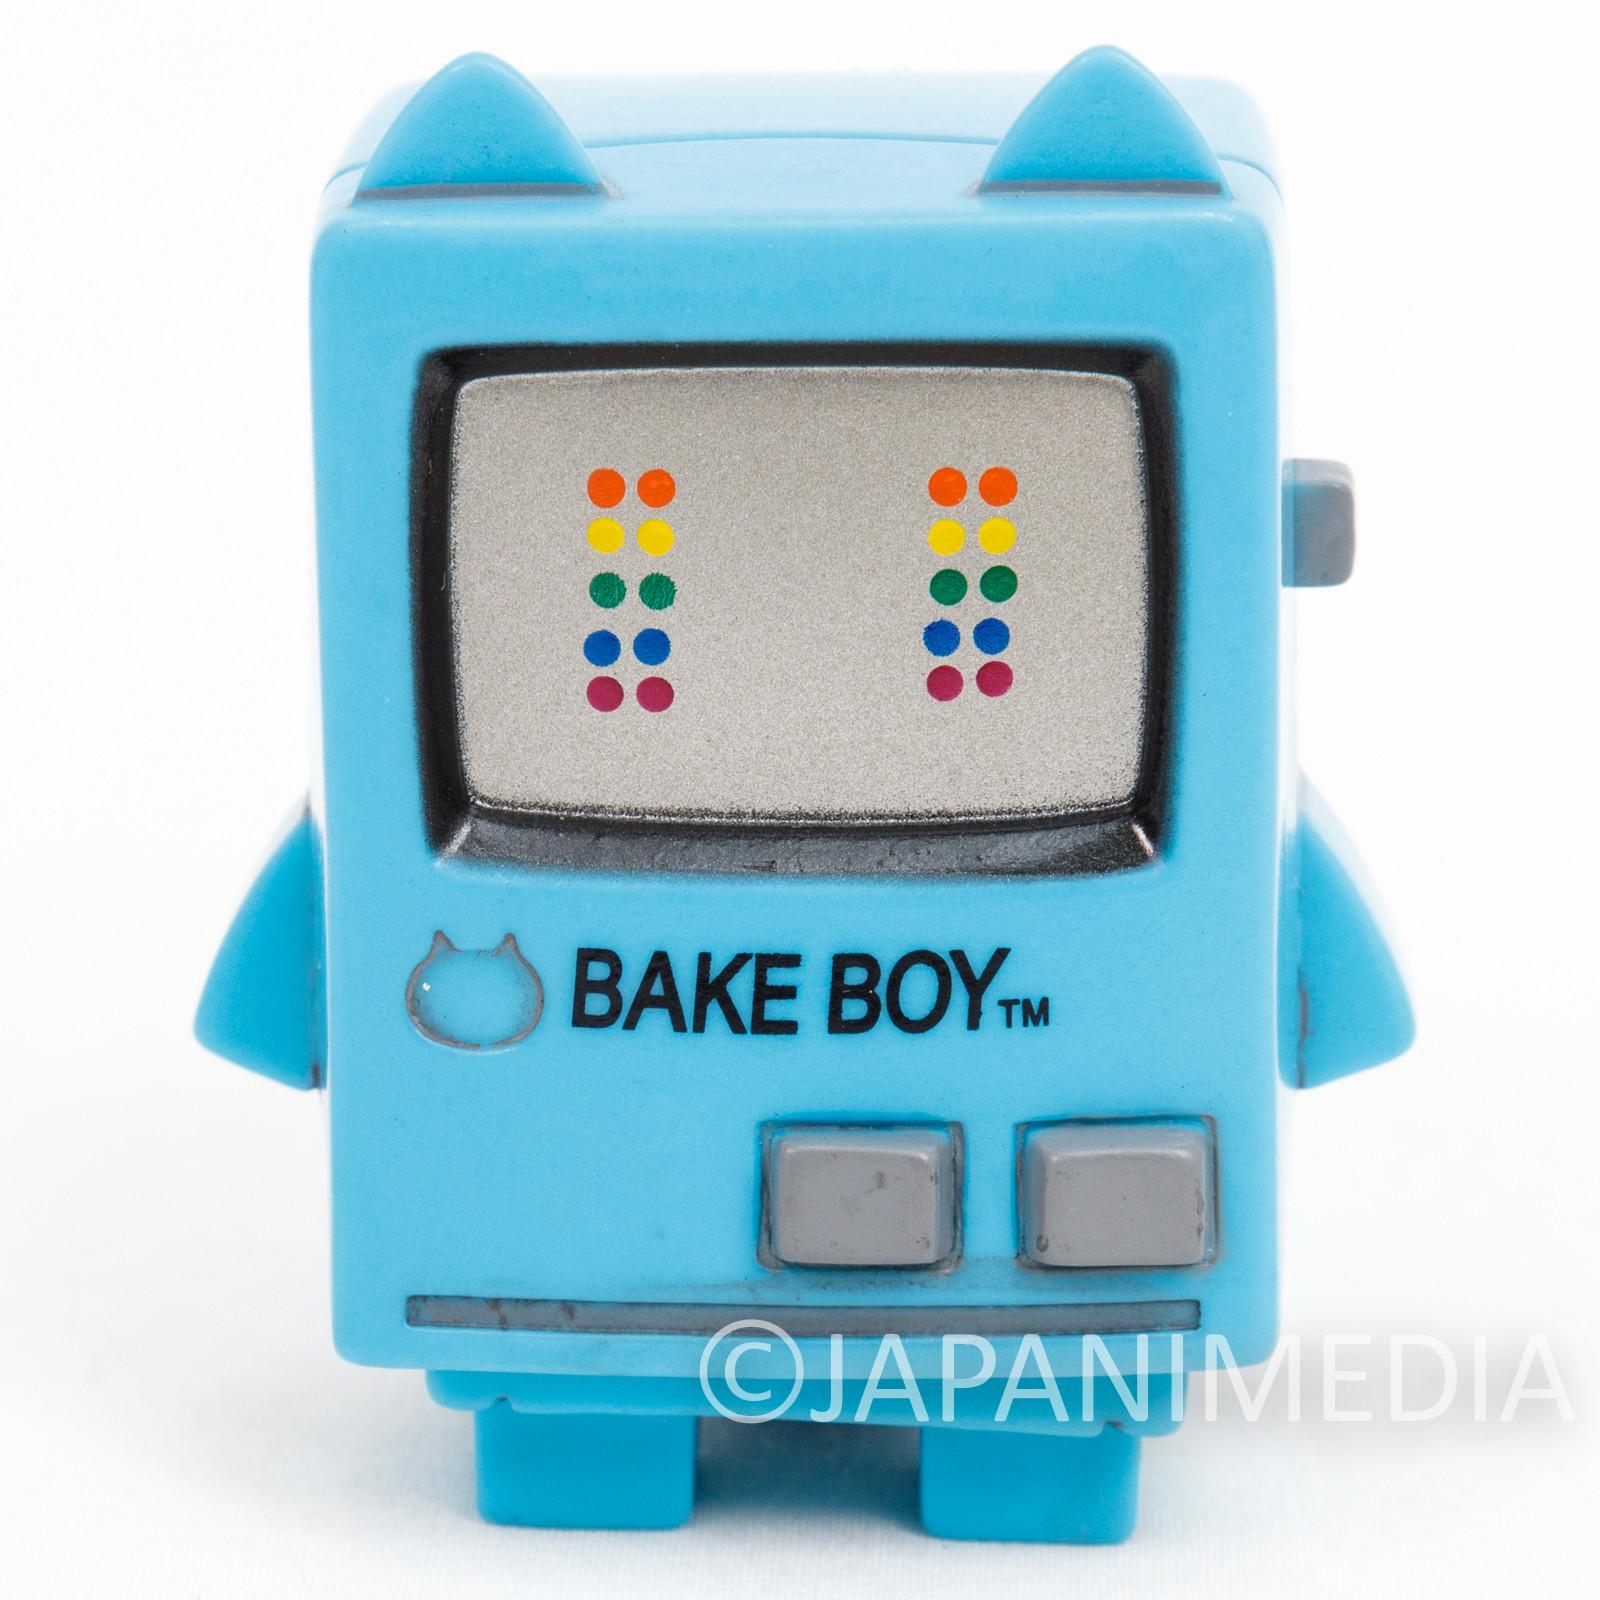 BAKETAN Blue ver. Soft Vinyl Figure Medicom Toy VAG Series JAPAN